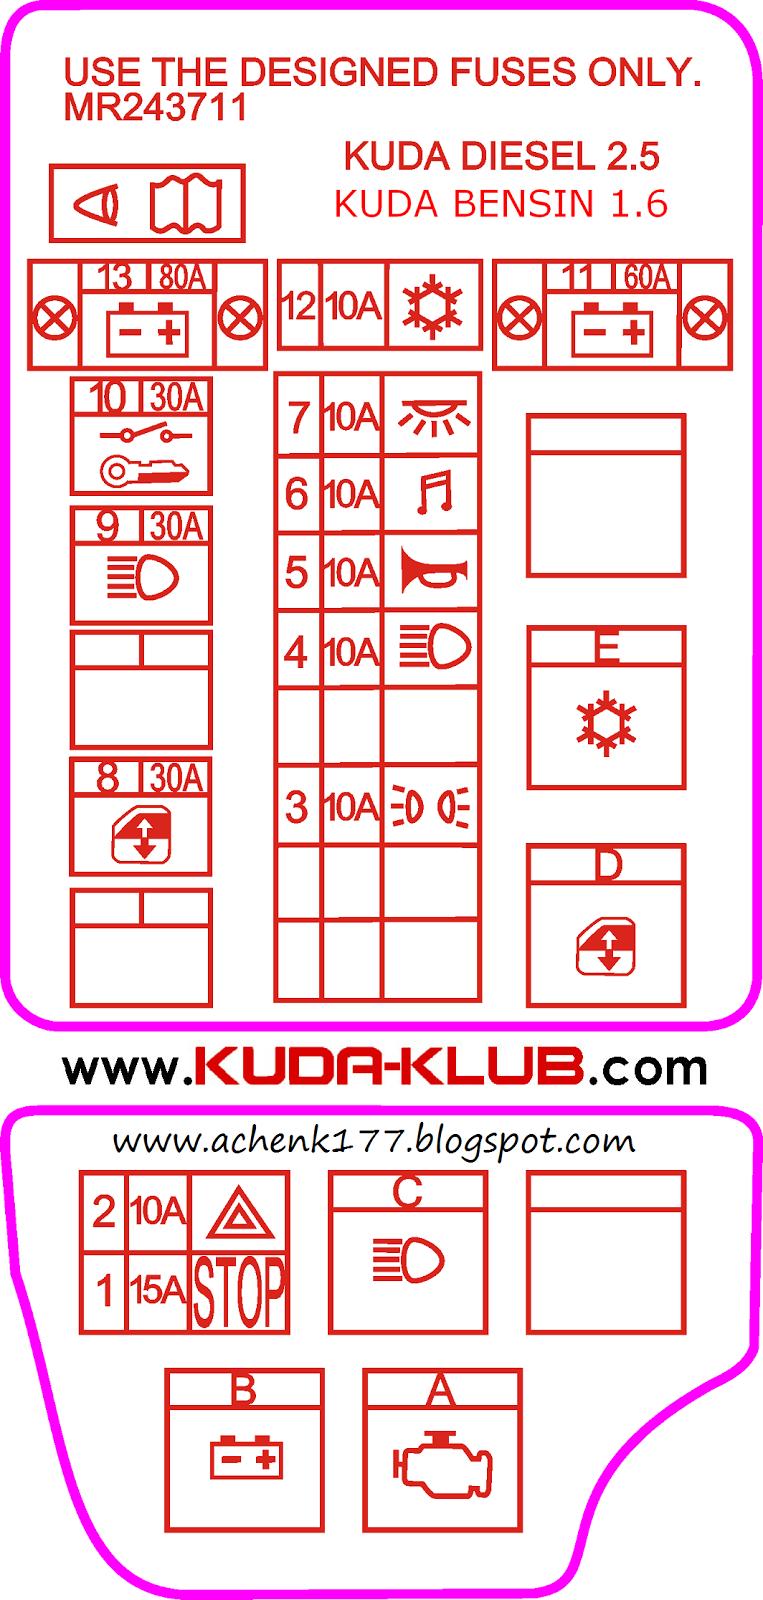 fuse box mitsubishi kuda example electrical wiring diagram u2022 rh huntervalleyhotels co Colt Mitsubishi Fuse Box 2007 Mitsubishi Outlander Fuse Box